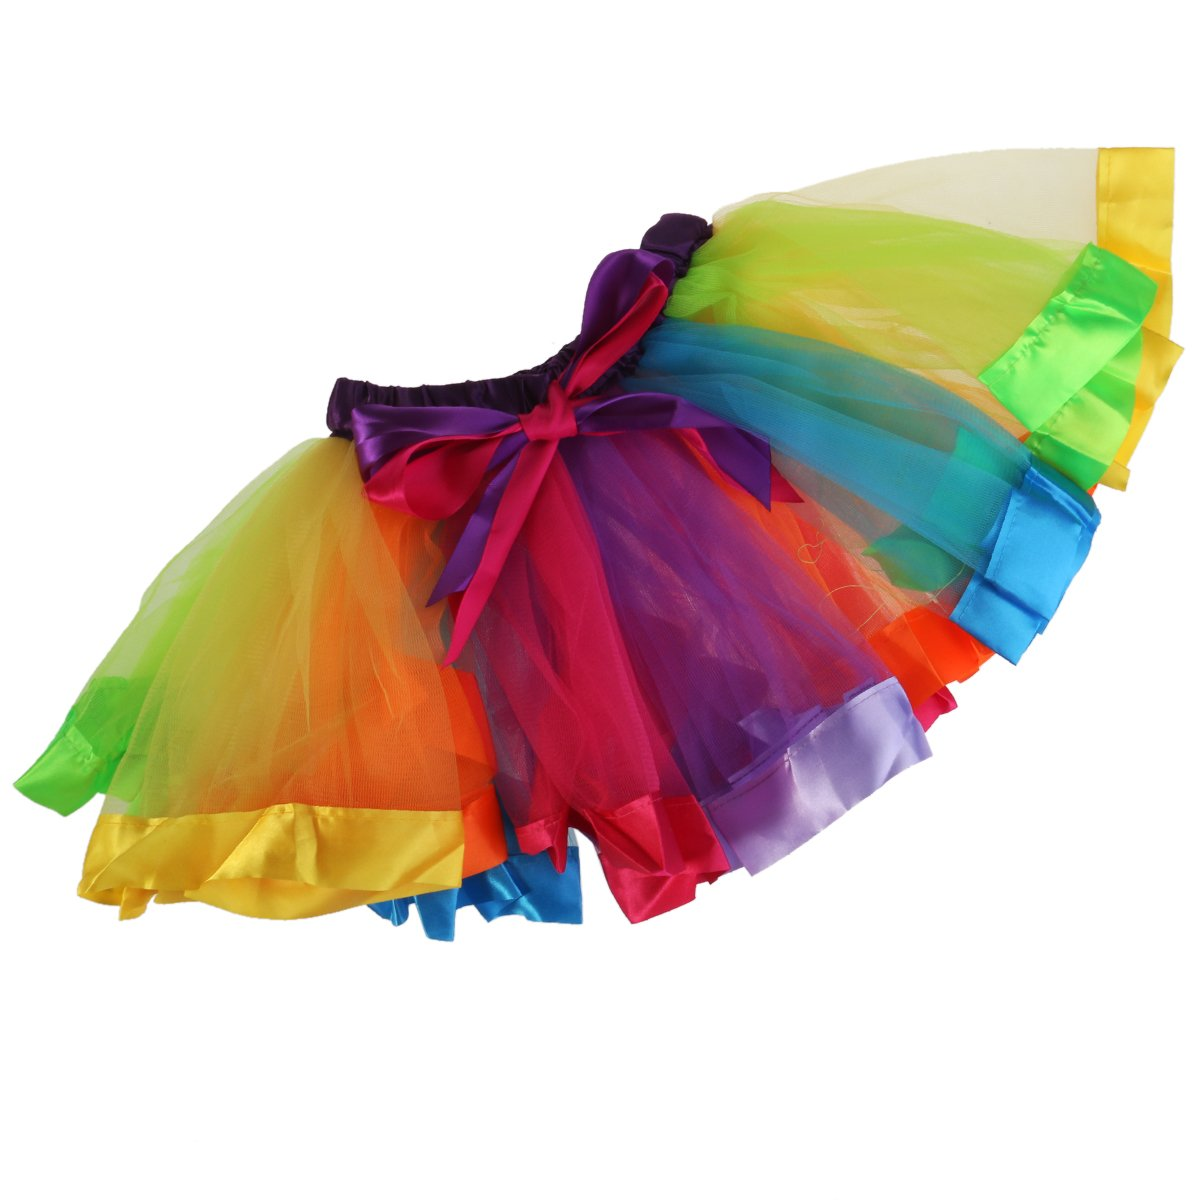 OULII Regenbogen Tutu Rock Mädchen Kinder Geschichteten Rainbow Regenbogen Tutu Ballettrock Tanzkleid Ballettkleid Ballettröckchen Rock - Größe L